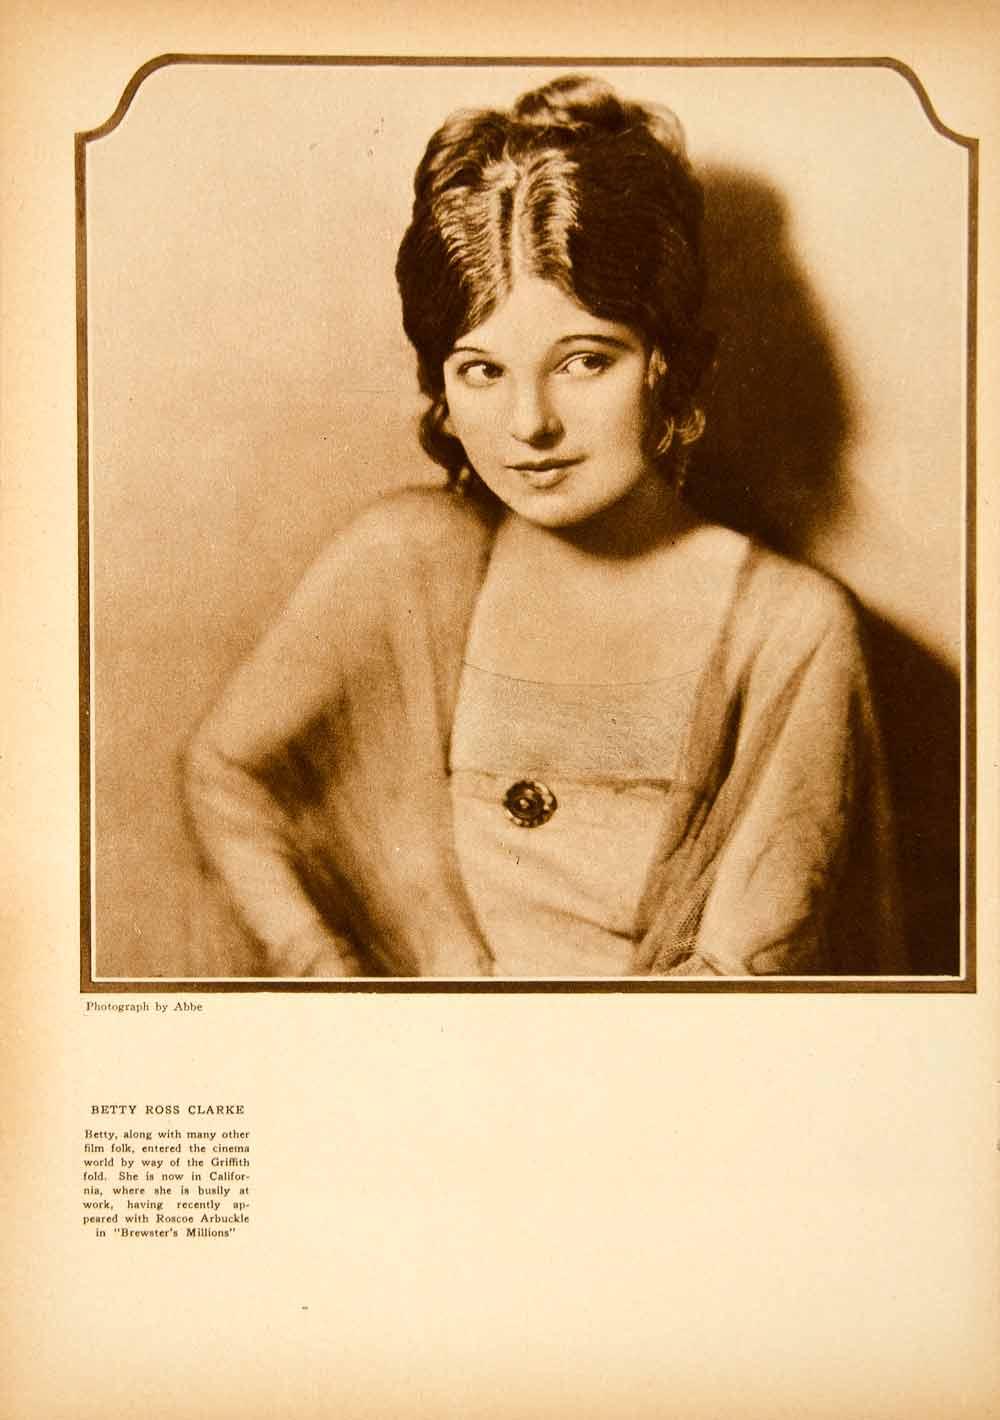 Betty Ross Clarke nudes (57 fotos) Young, Twitter, bra